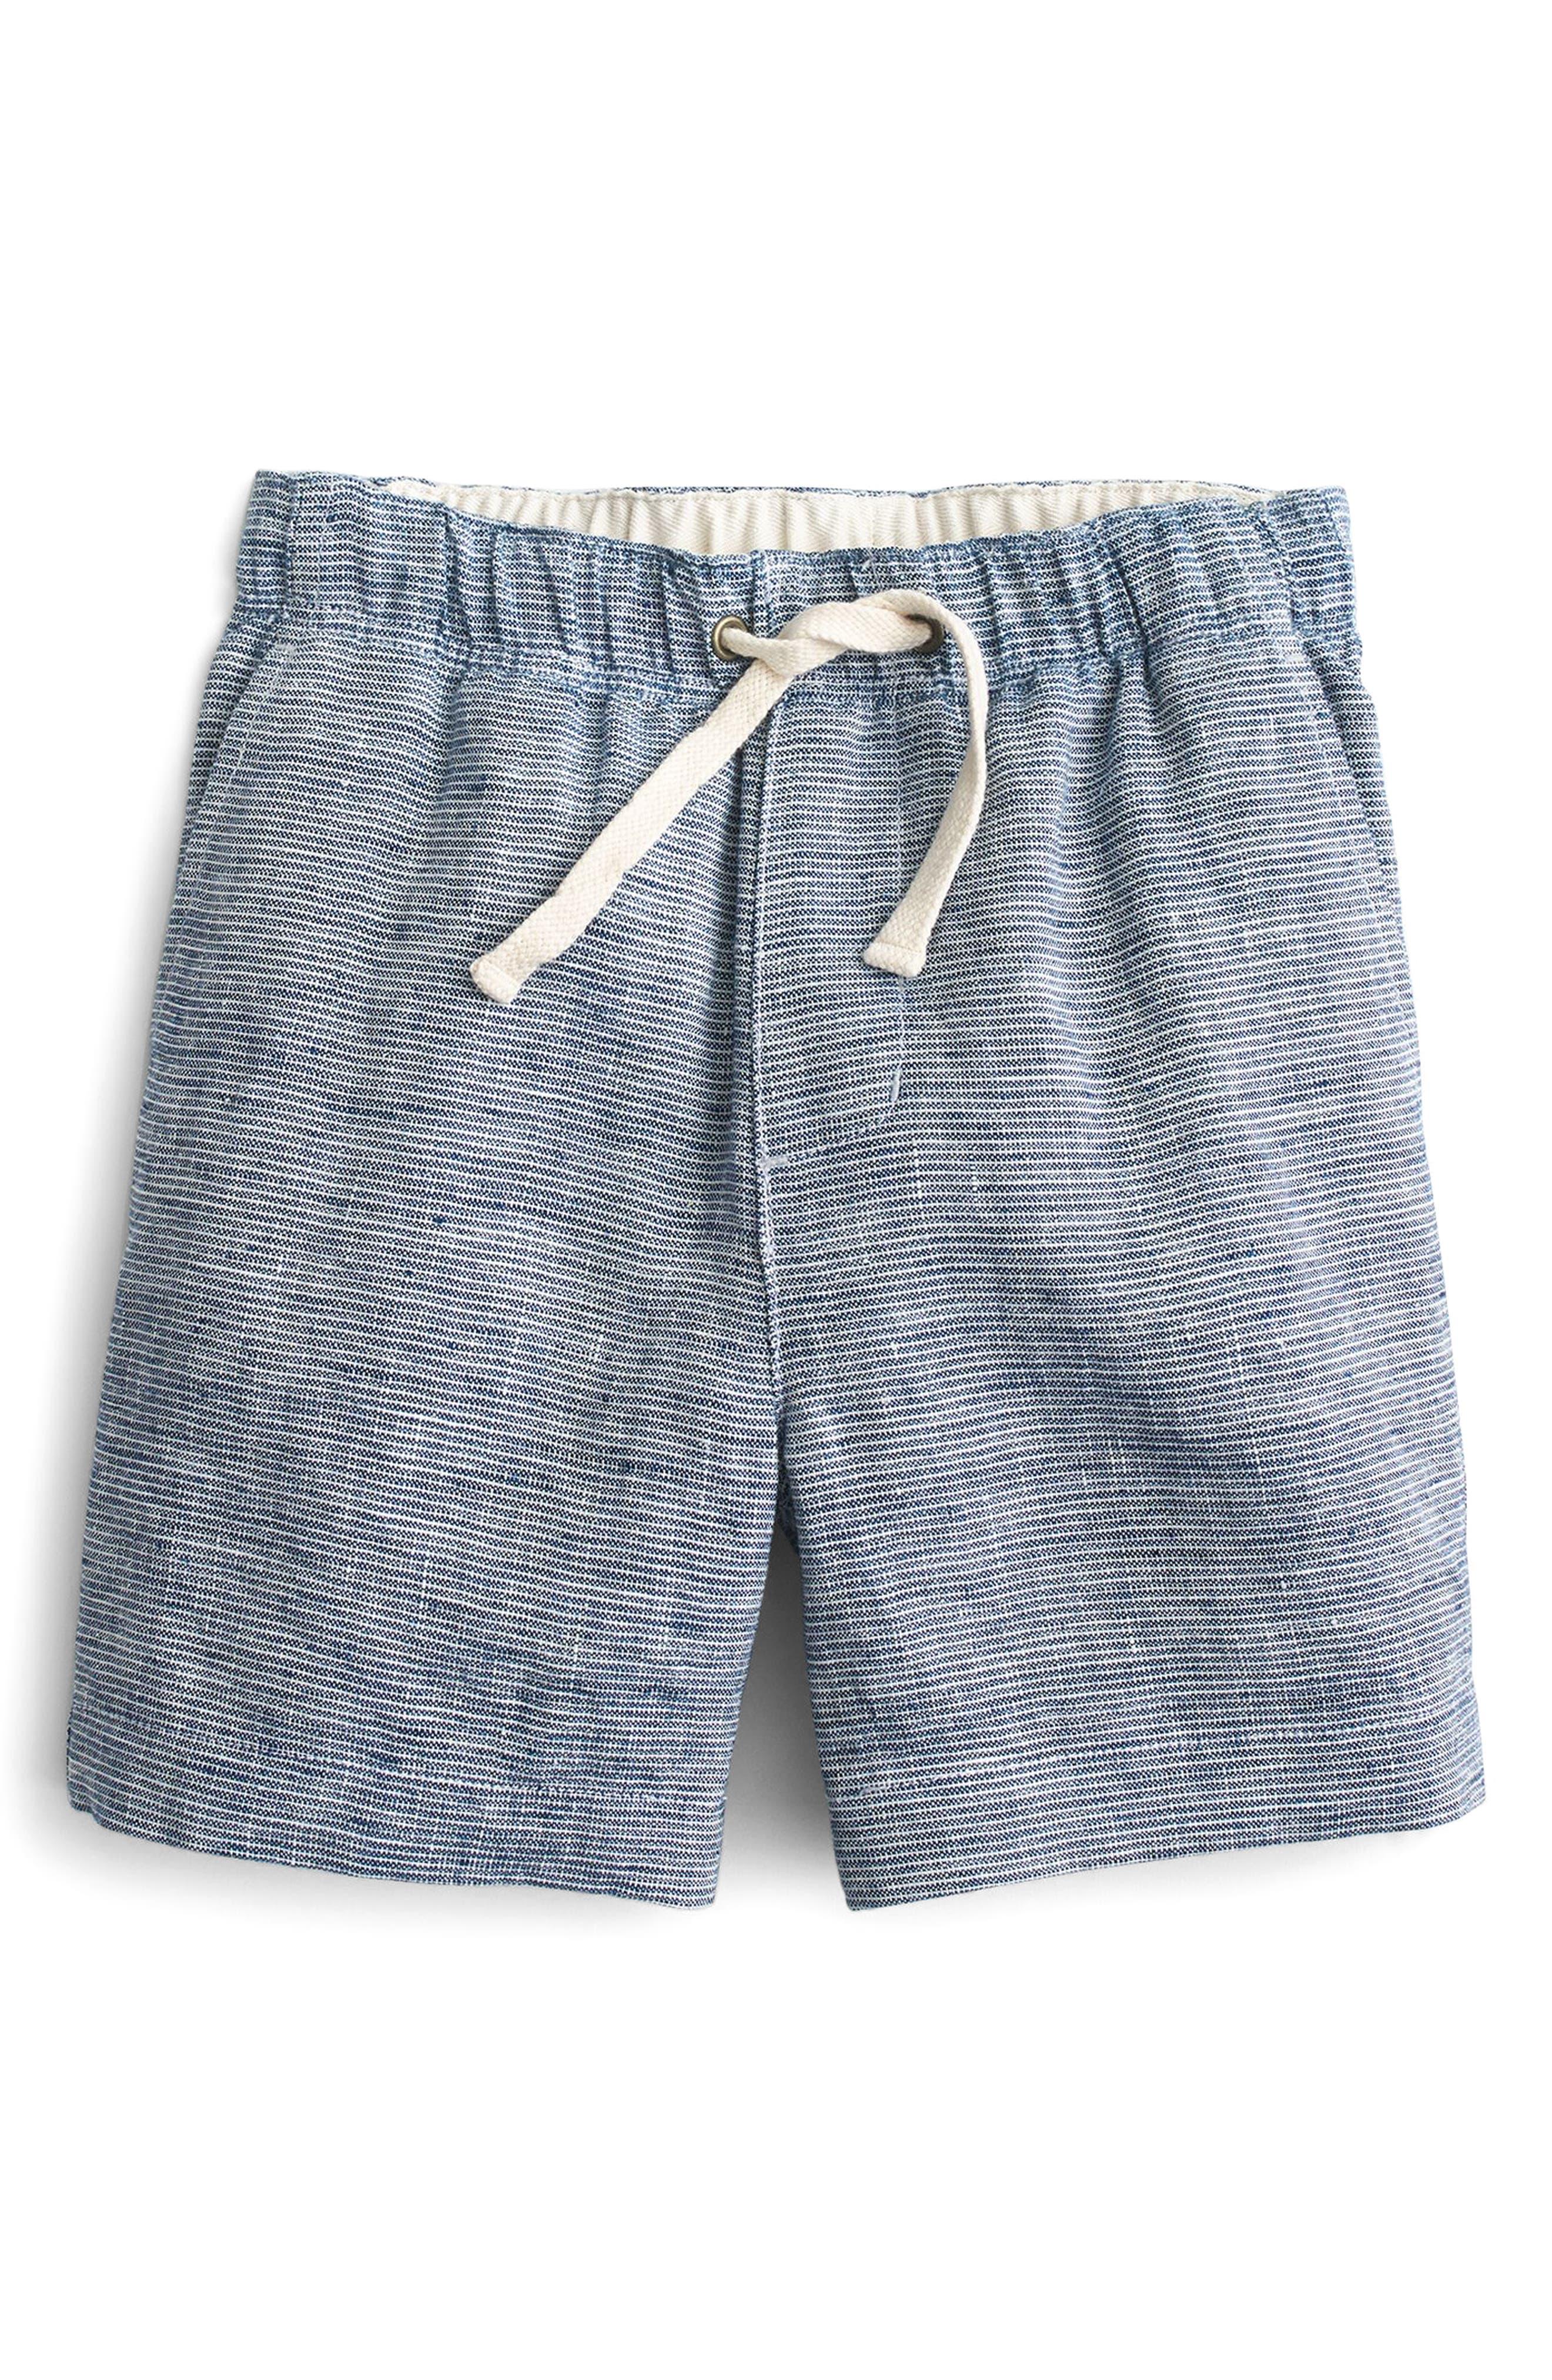 Alternate Image 1 Selected - crewcuts by J.Crew Stripe Linen Dock Shorts (Toddler Boys, Little Boys & Big Boys)